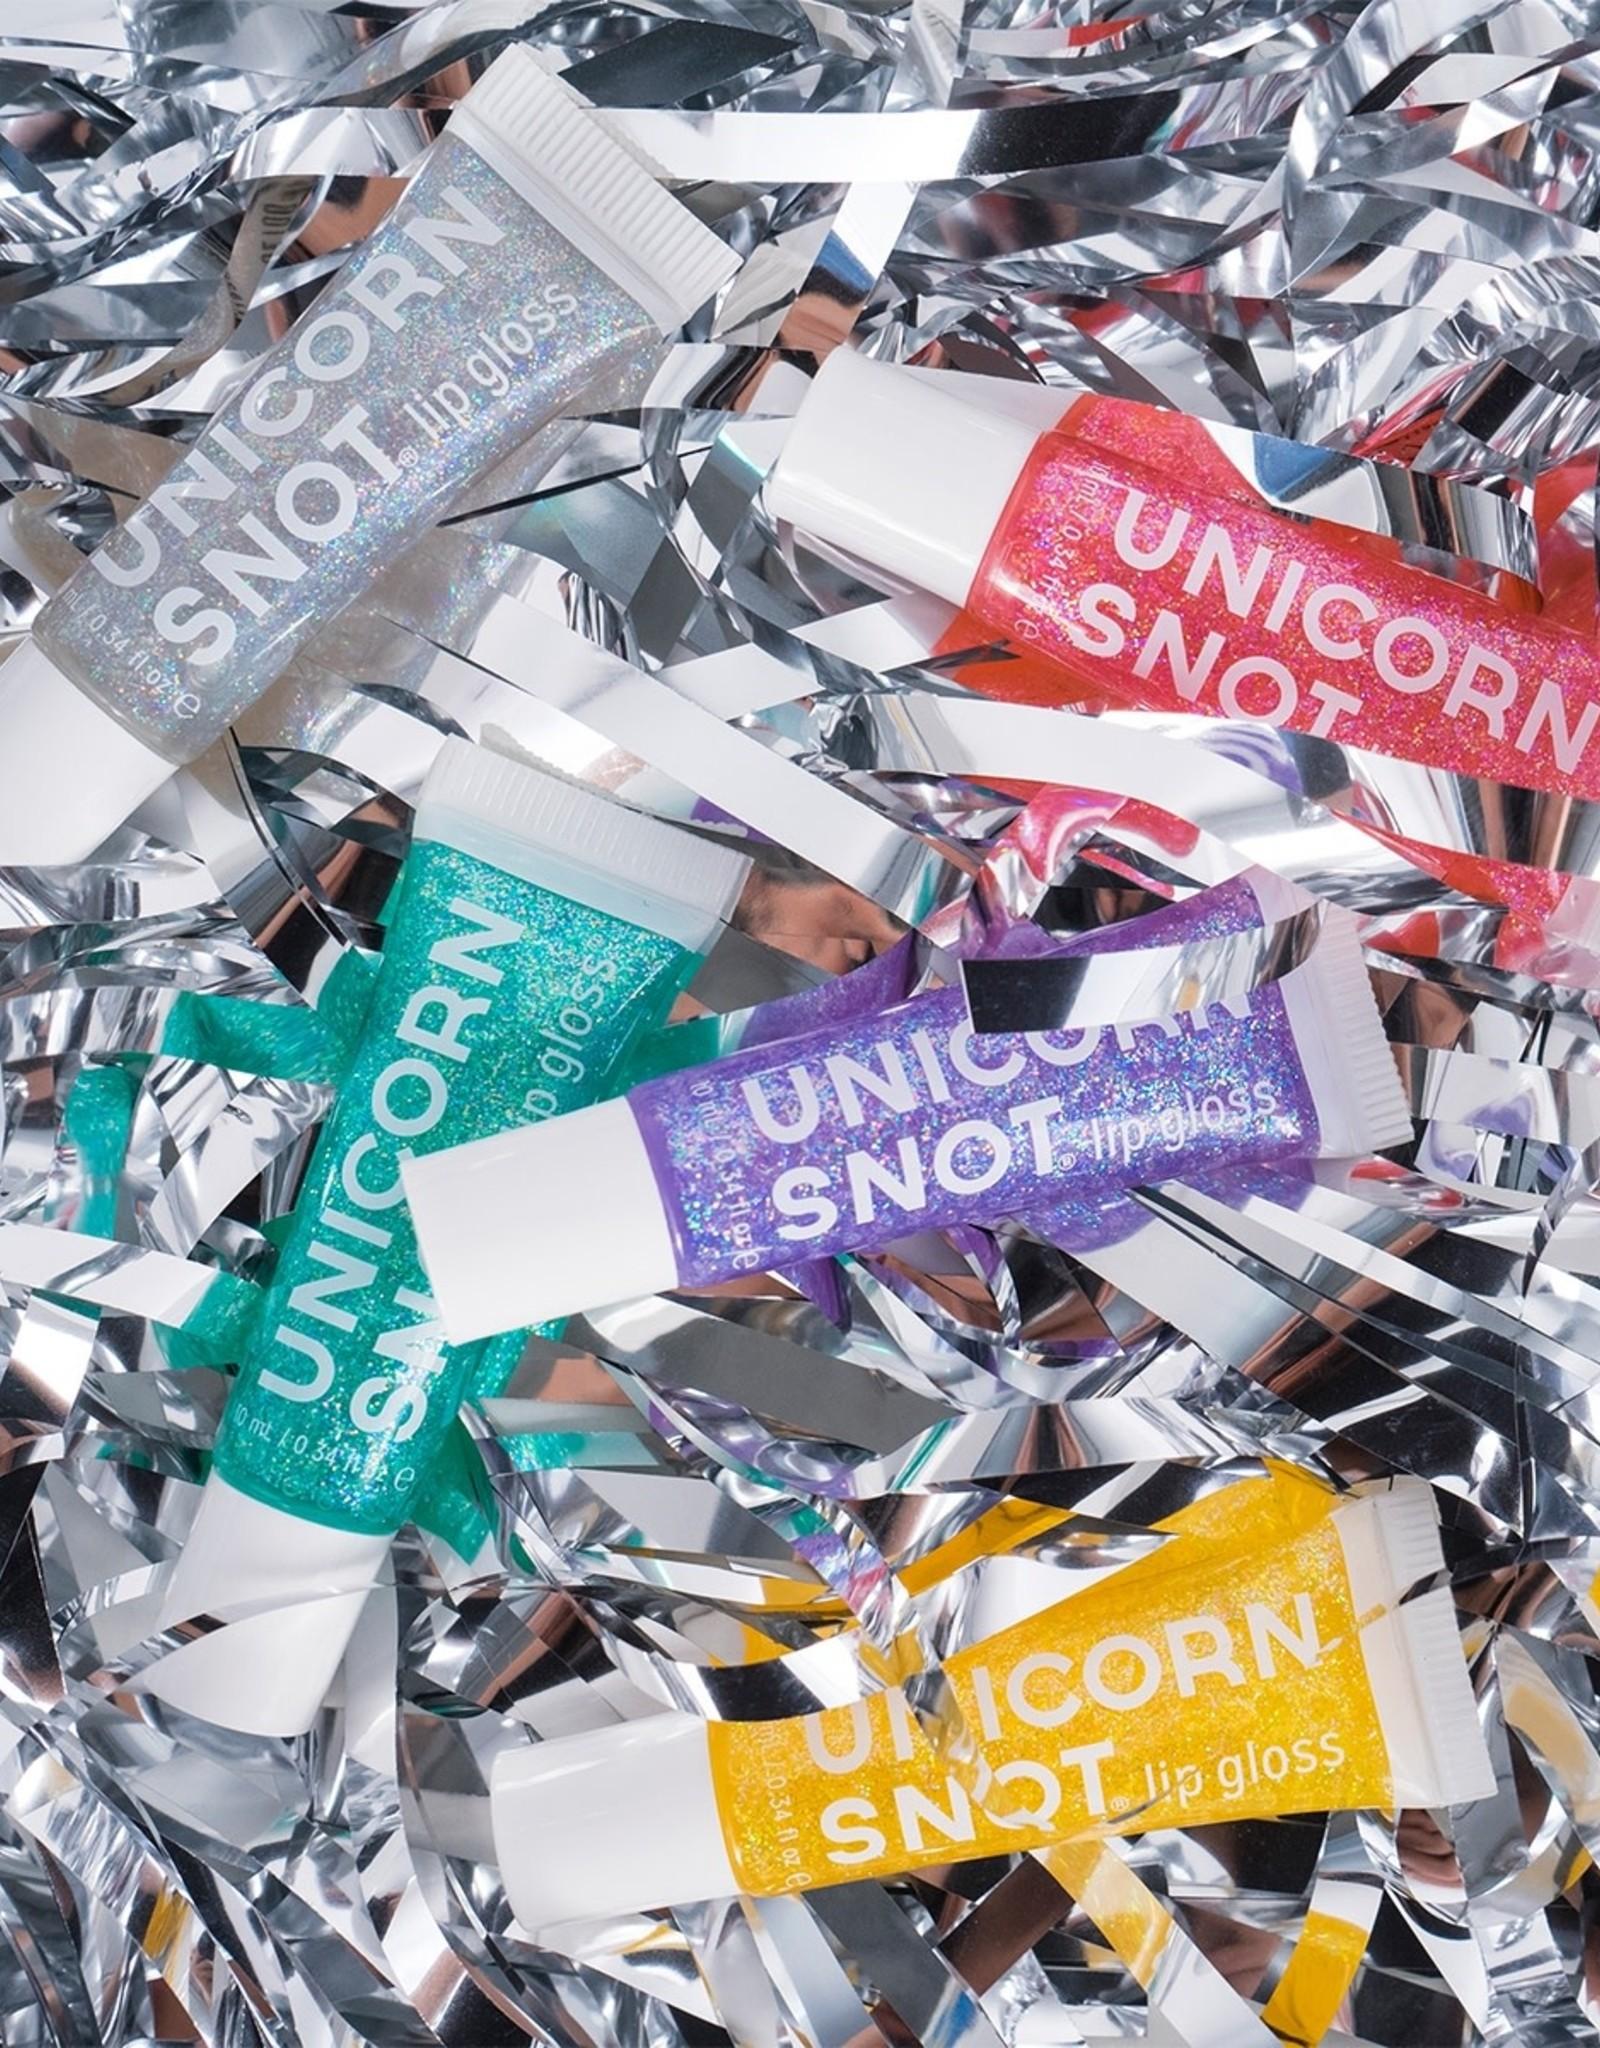 Unicorn Snot Lip Gloss - Cotton Candy Scented